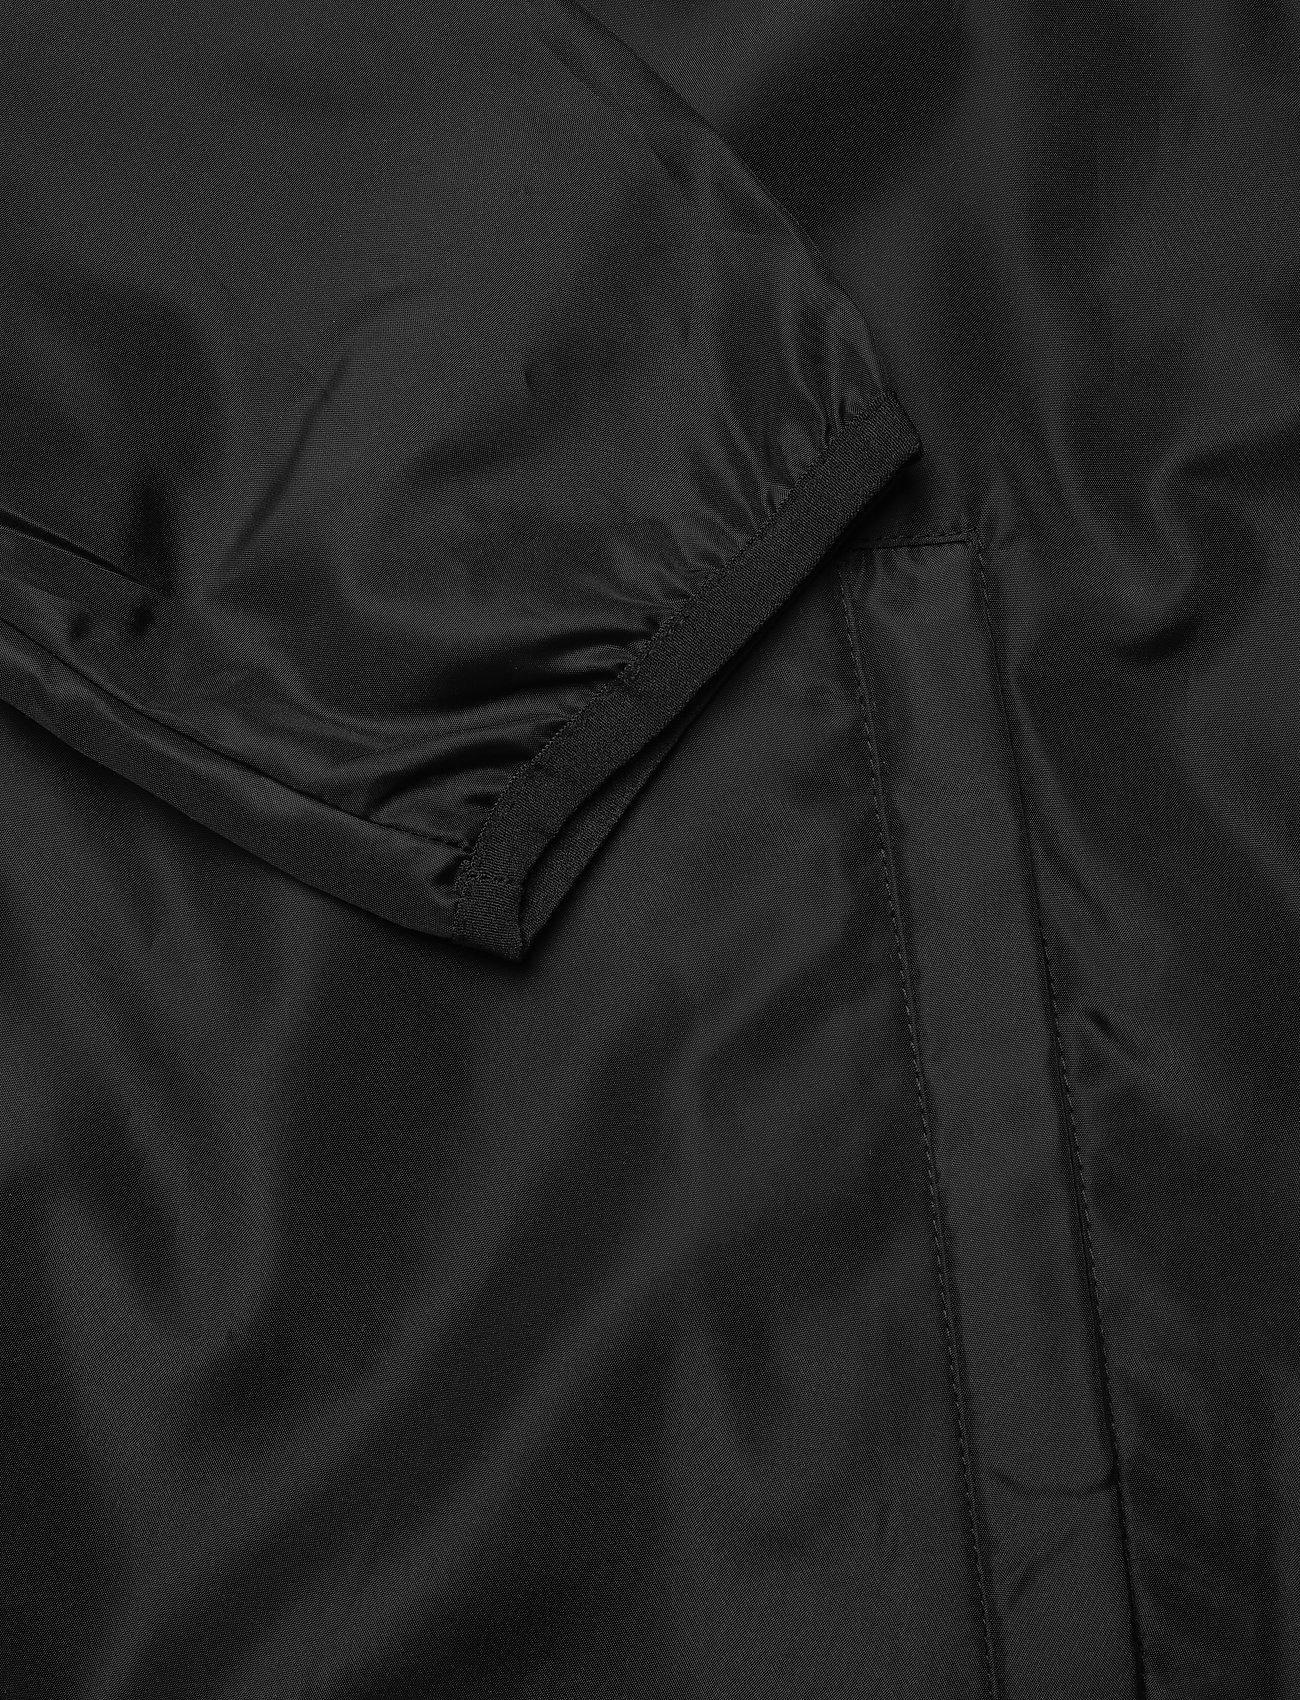 DEDICATED - Windbreaker Skara Black - kurtki-wiosenne - black - 4